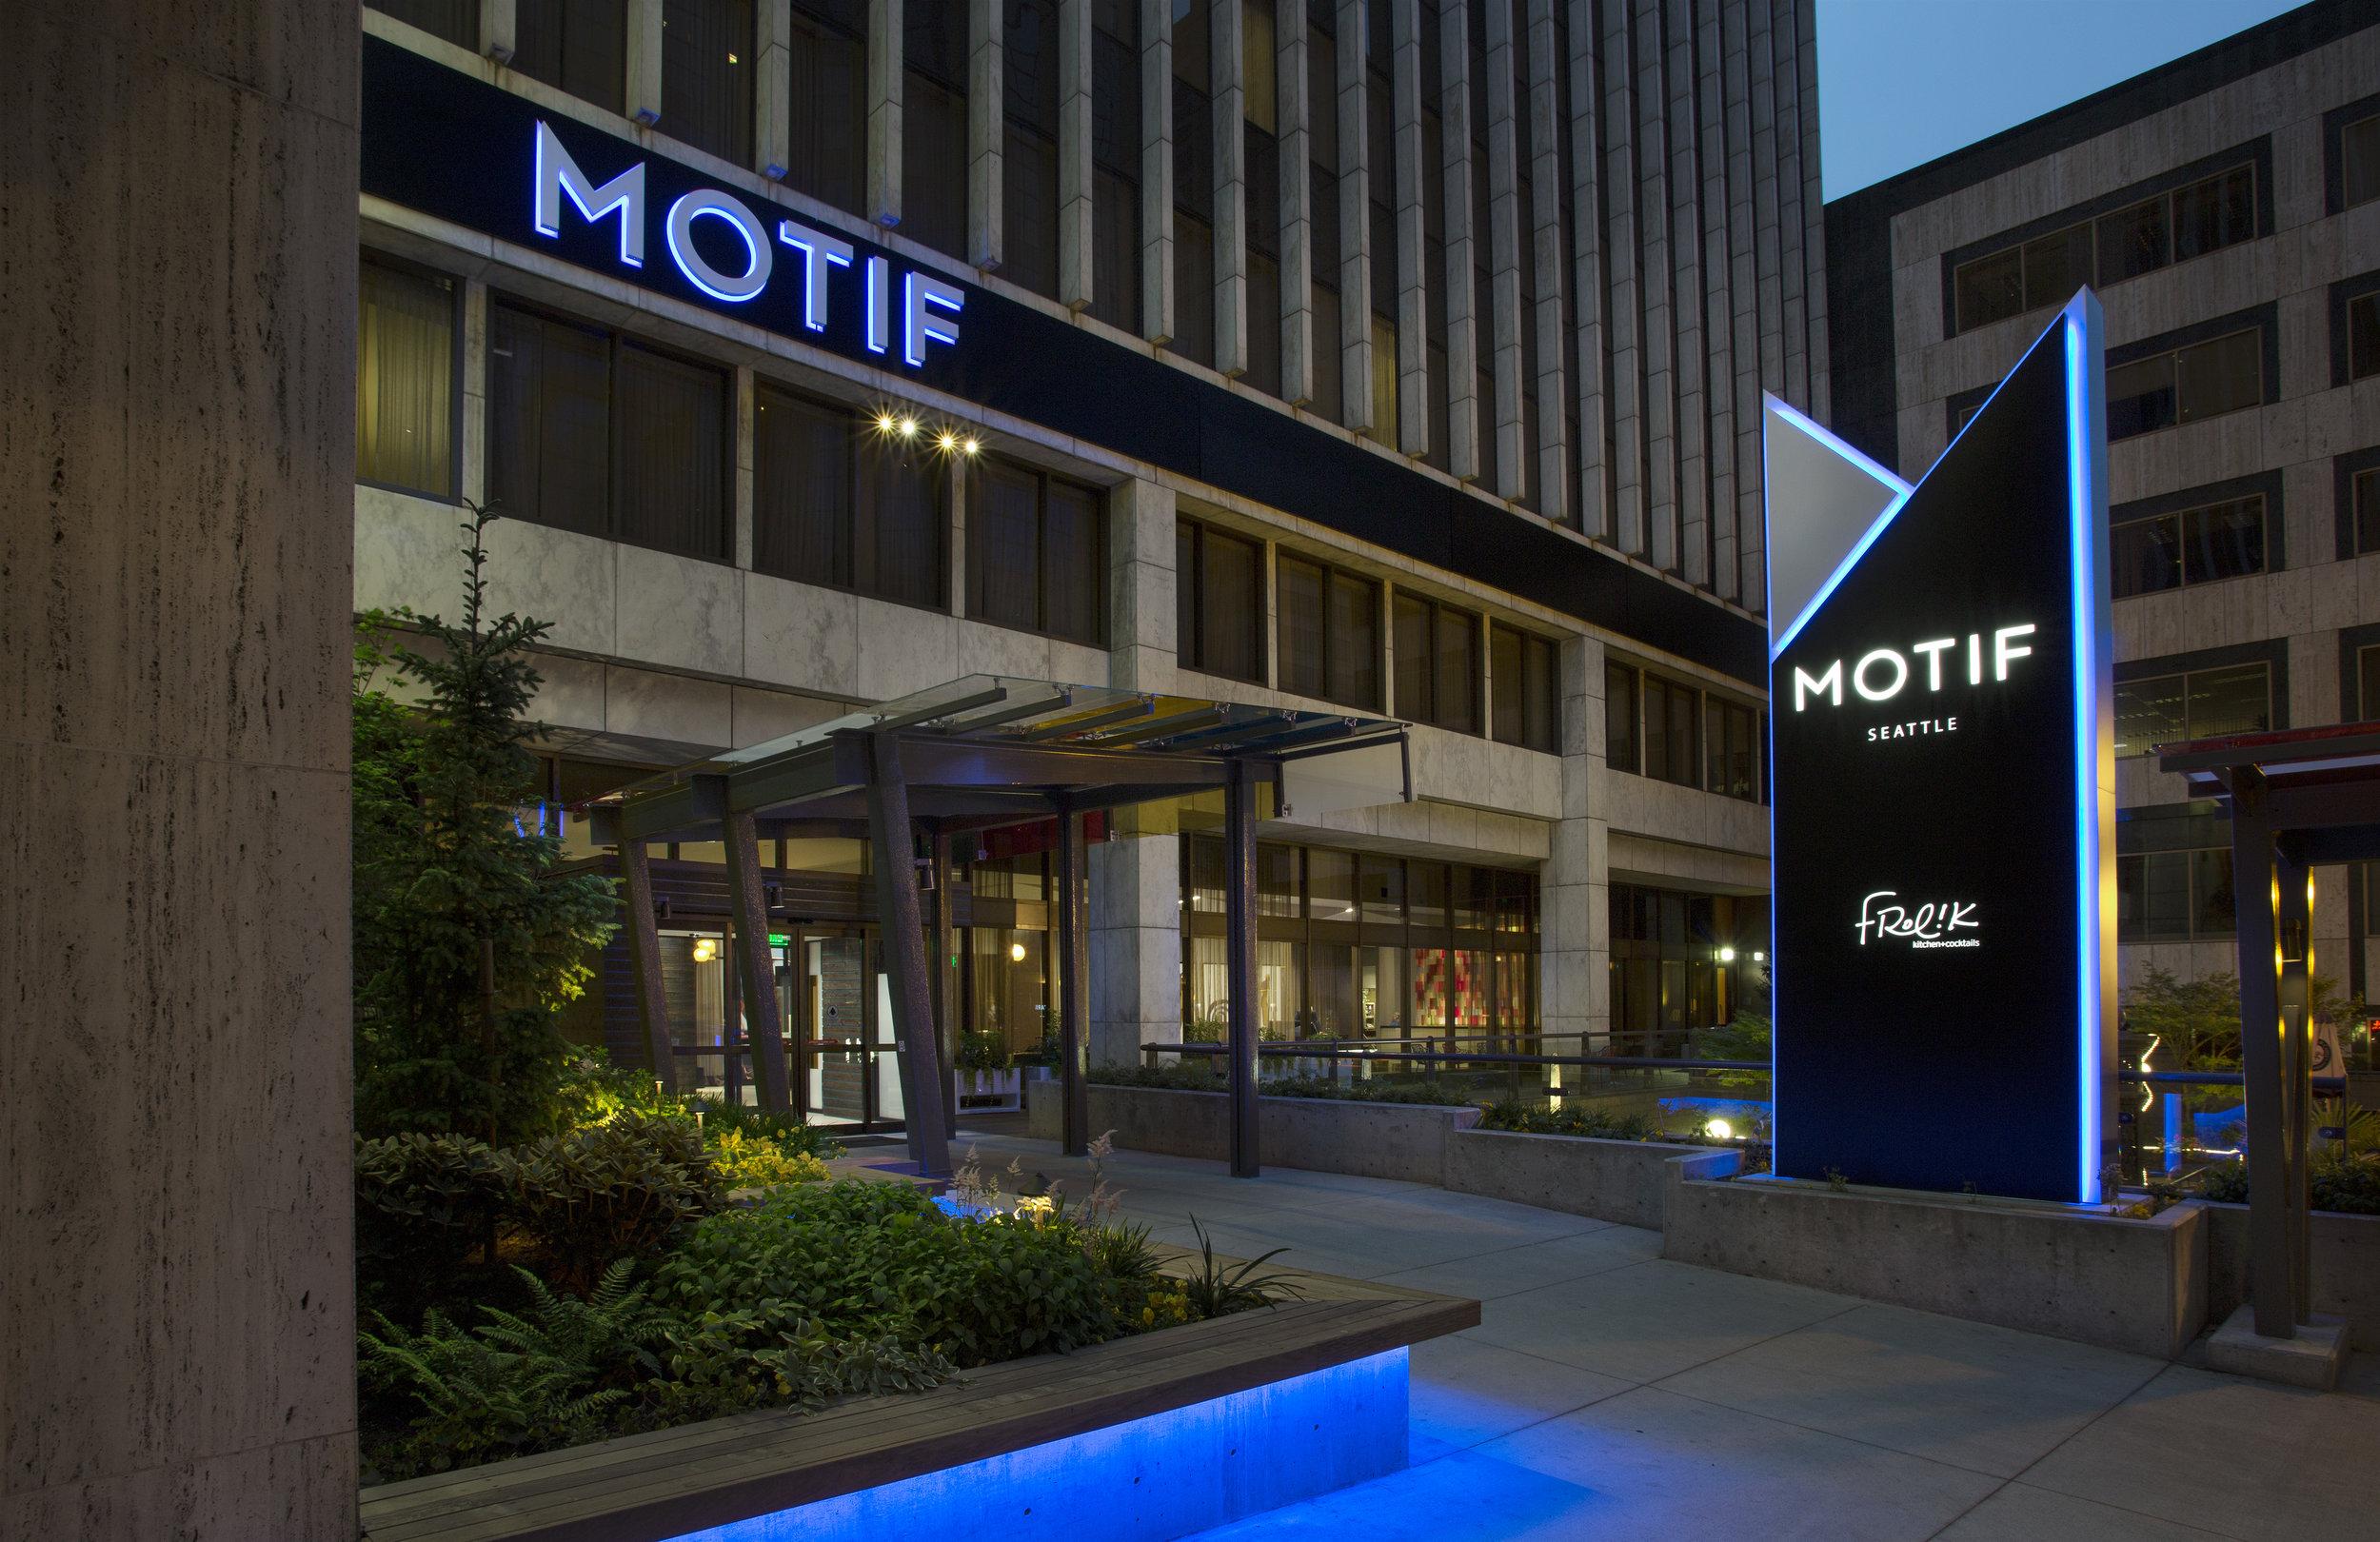 MOTIF-1287.jpg